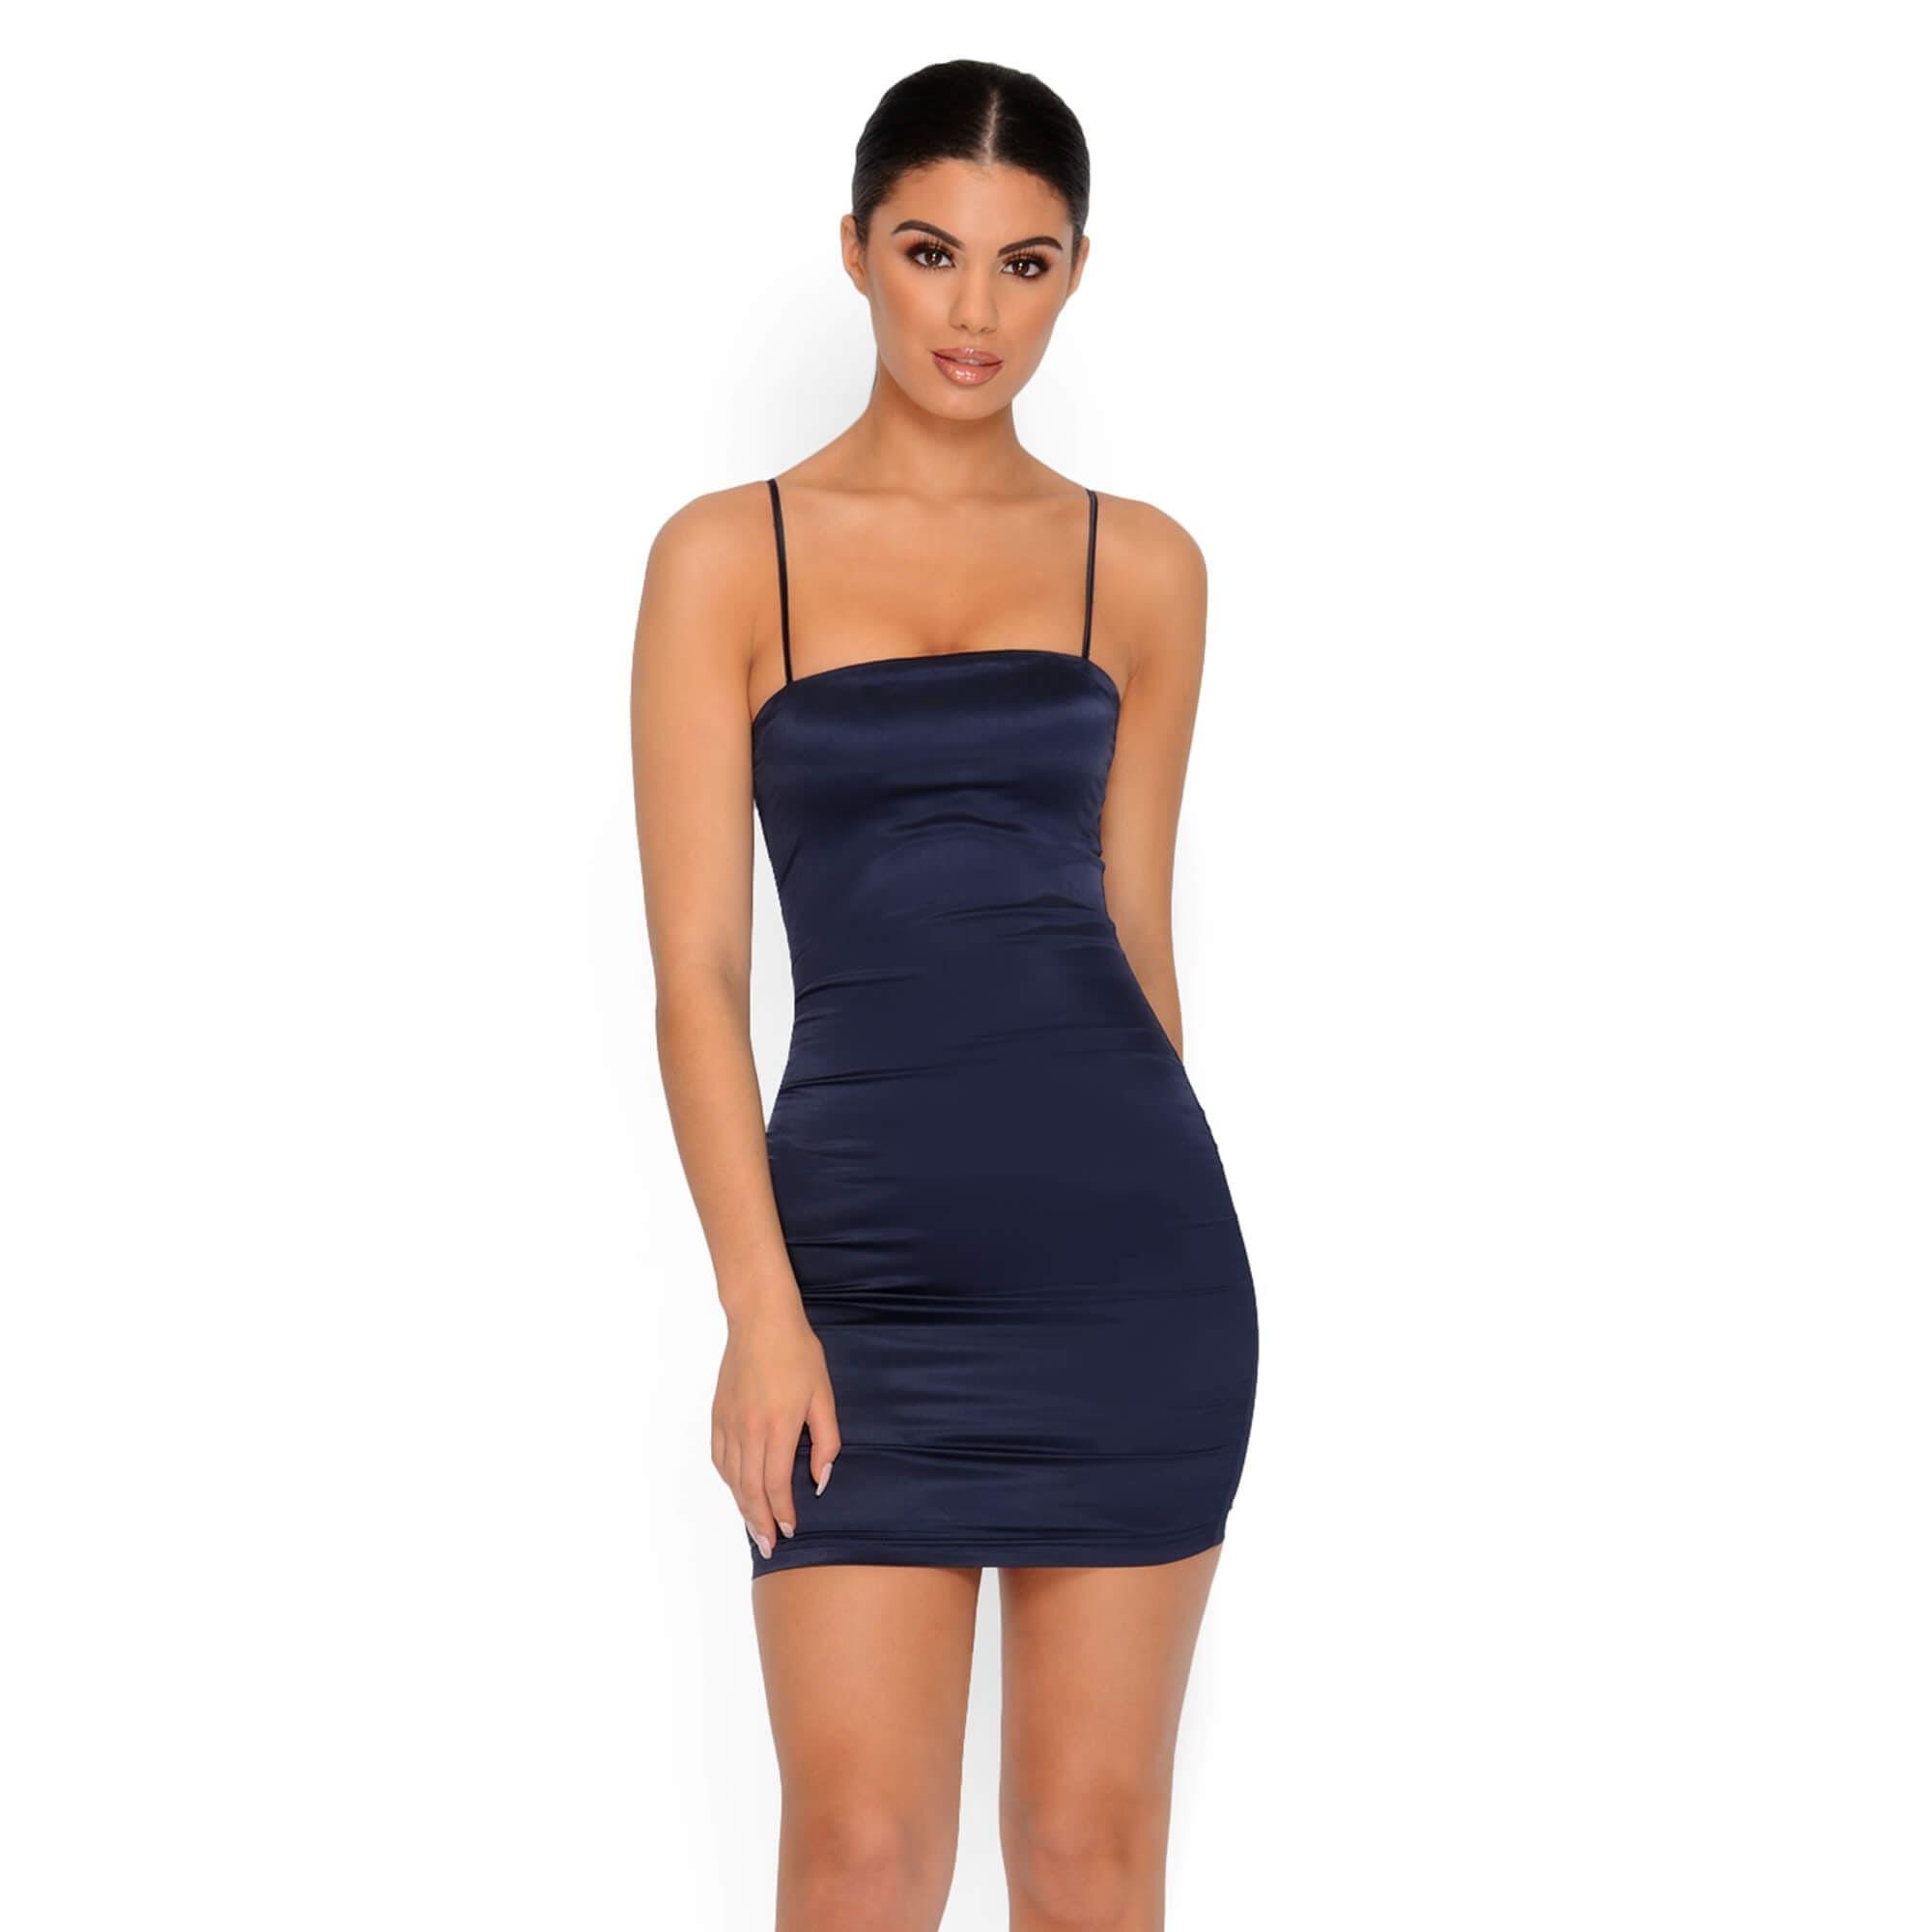 f12bb06a11 Satin Mini Dress with Thin Straps - Main